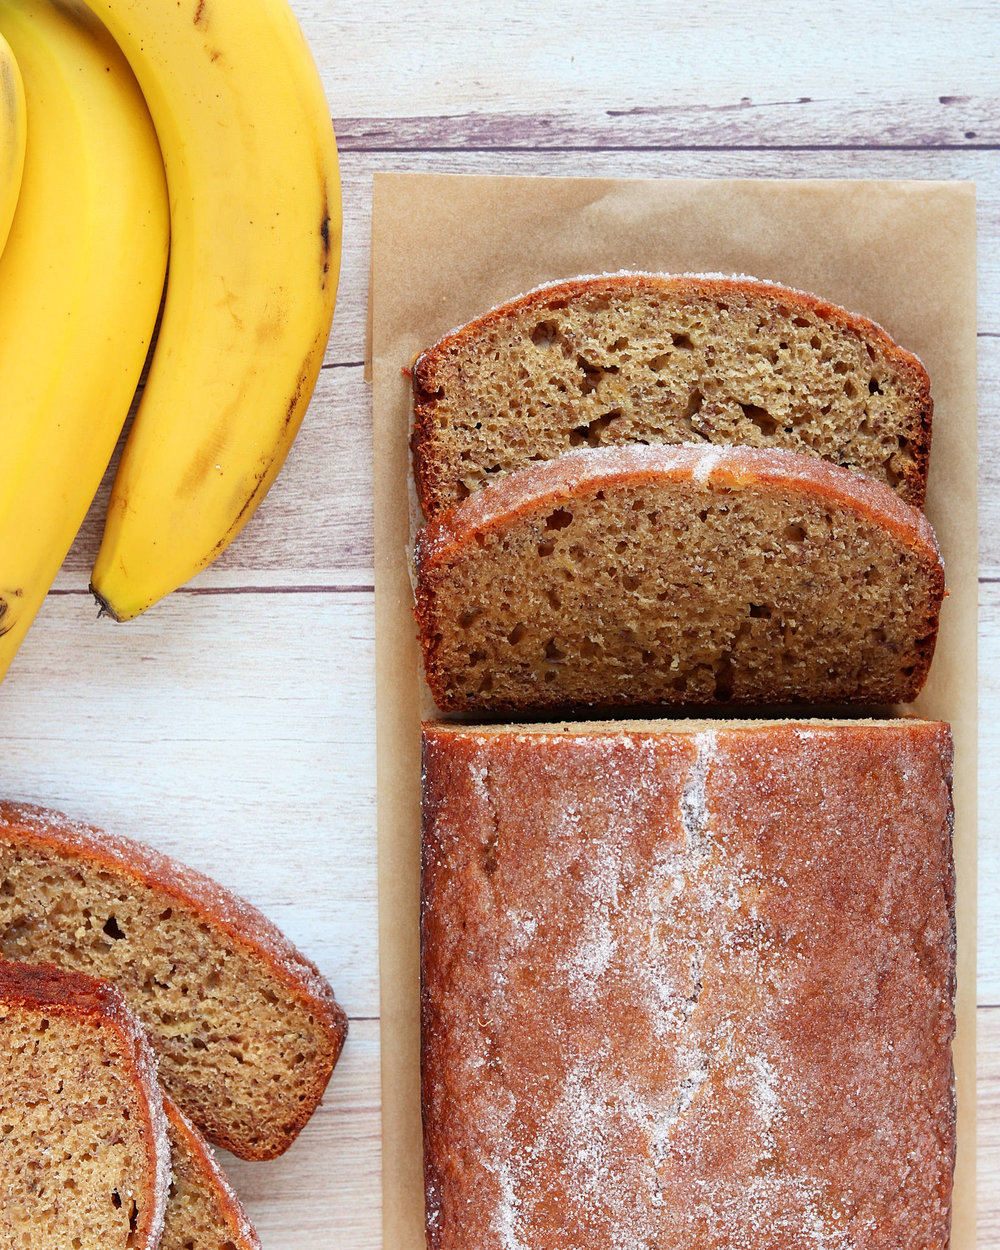 Banana Bread made by Elizabeth Larsen